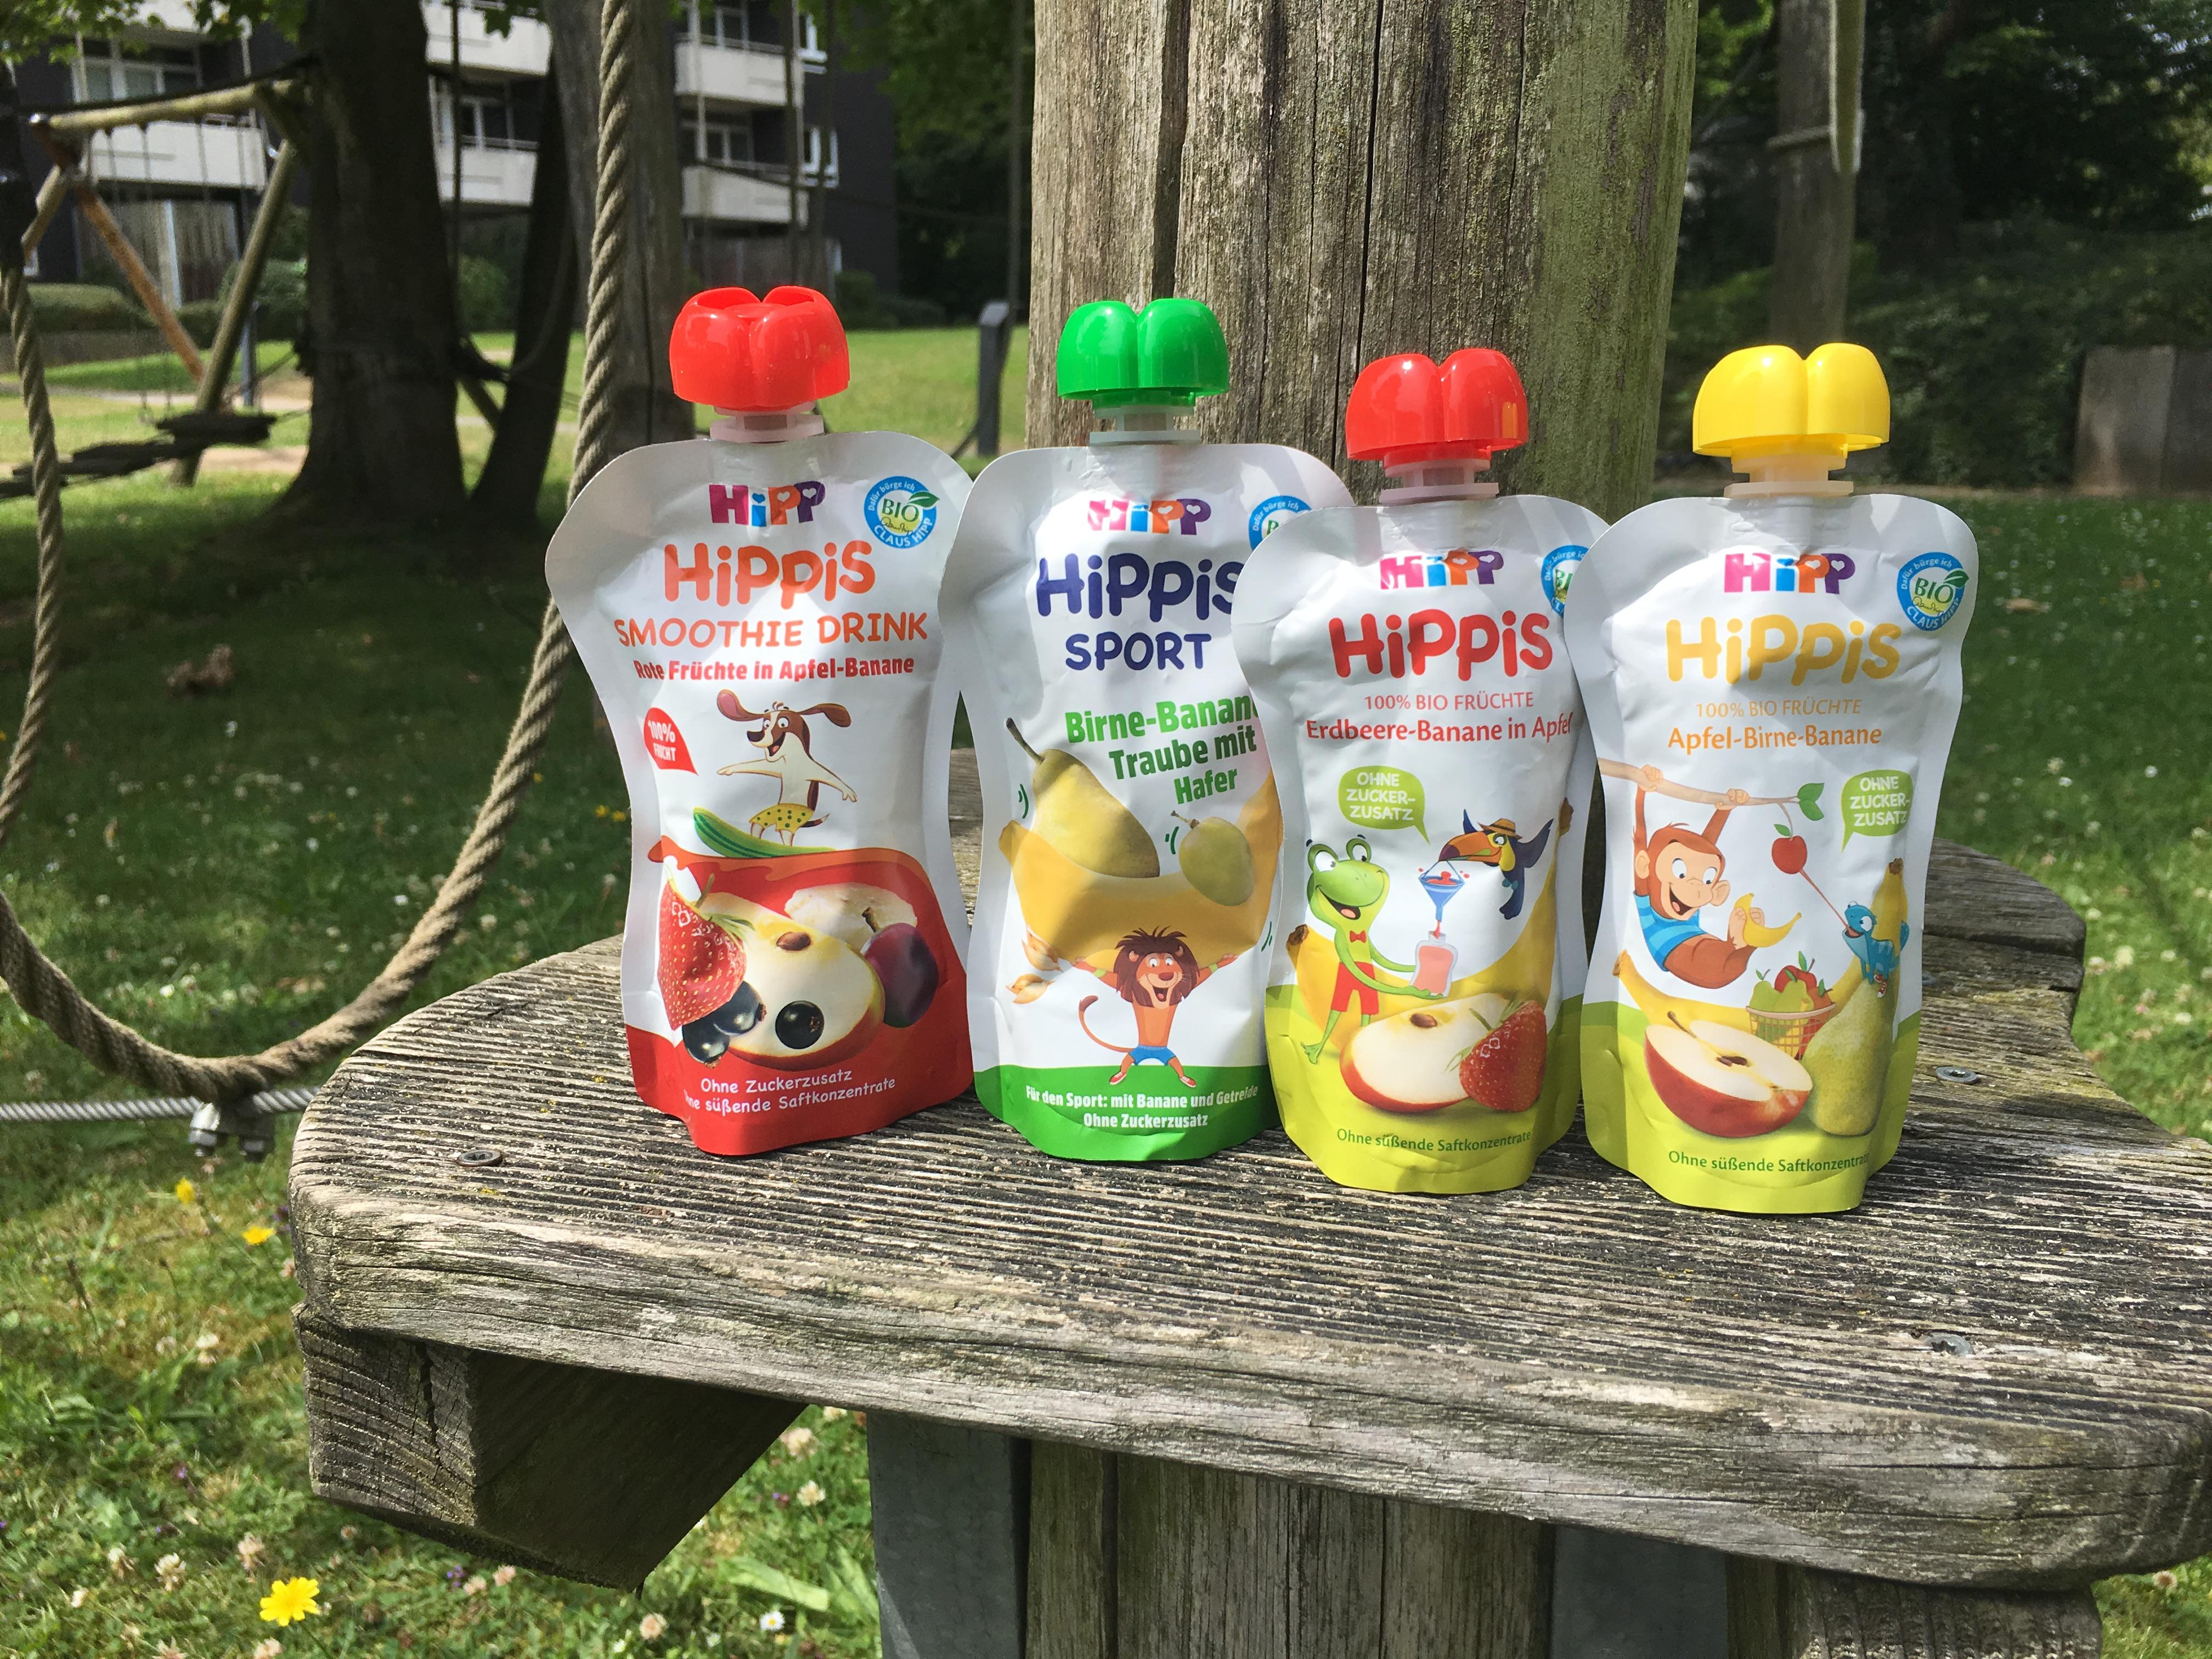 Hipp hippis smoothie sport